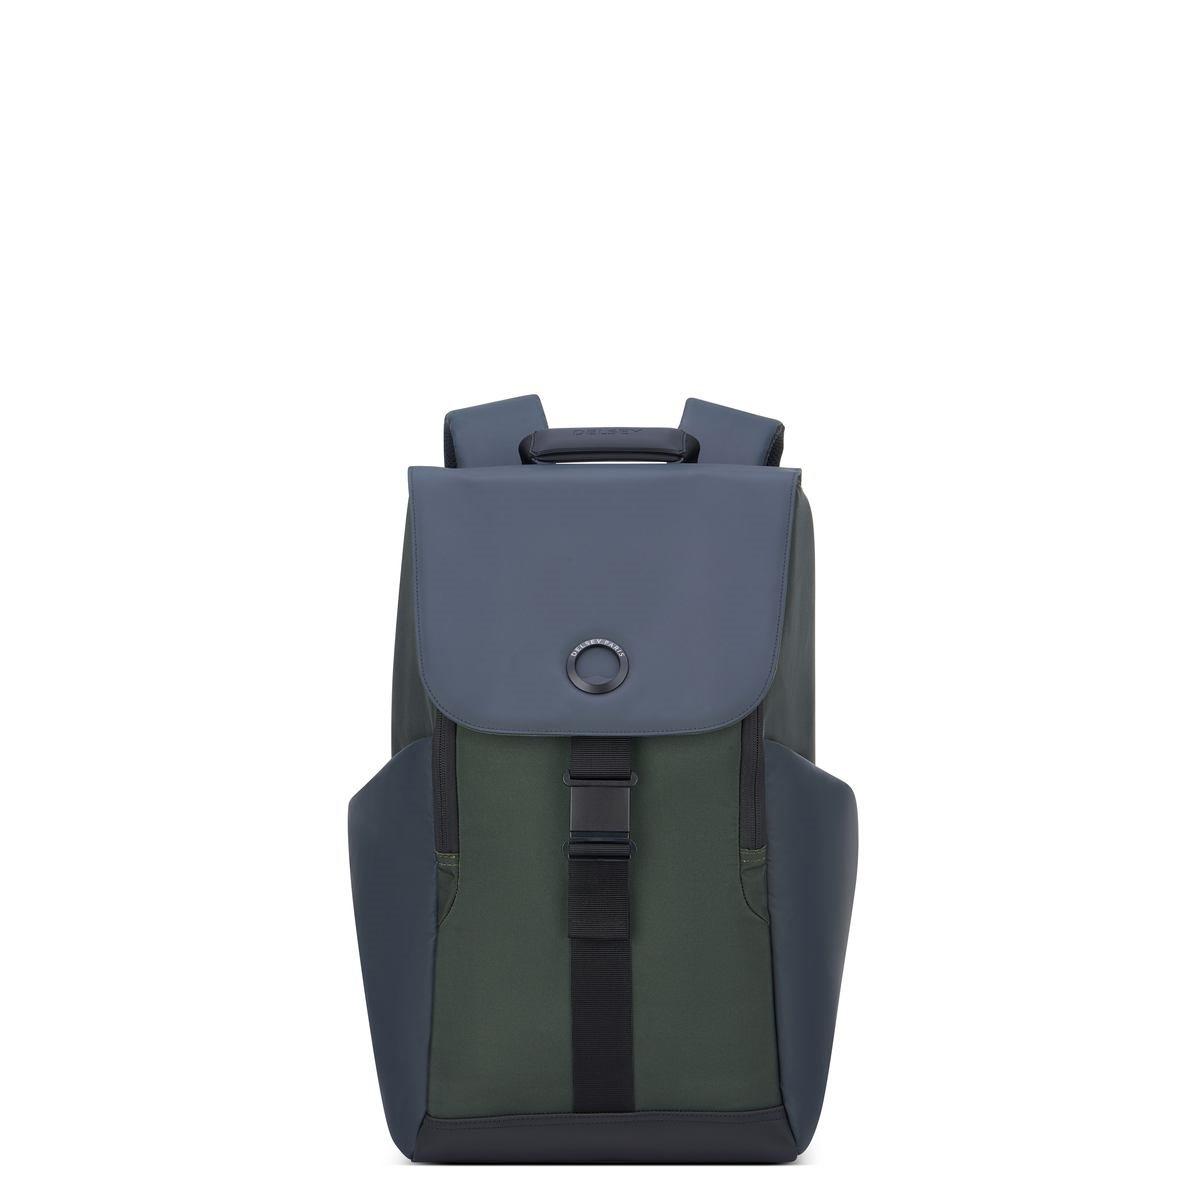 Delsey Σακίδιο πλάτης με θέση PC 15,6'' 45,5x31,5x14,5cm σειρά Securflap Army